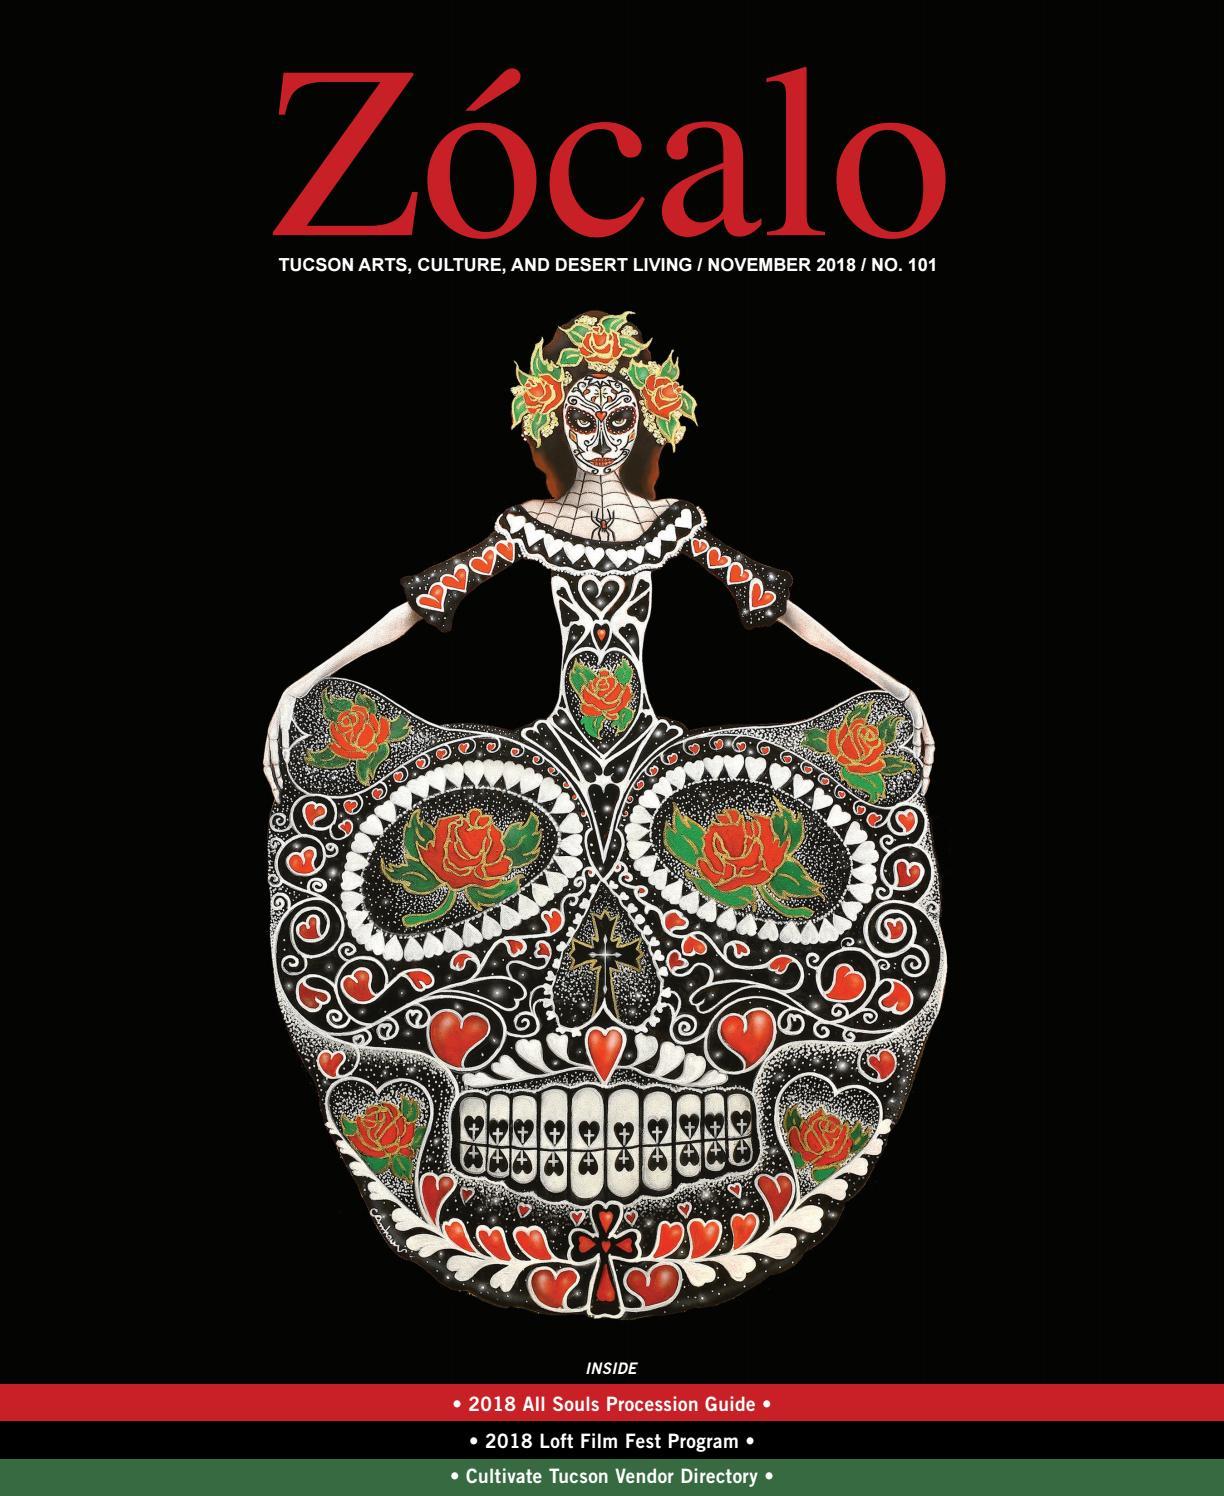 Zocalo Magazine - November 2018 by Zocalo Magazine - issuu